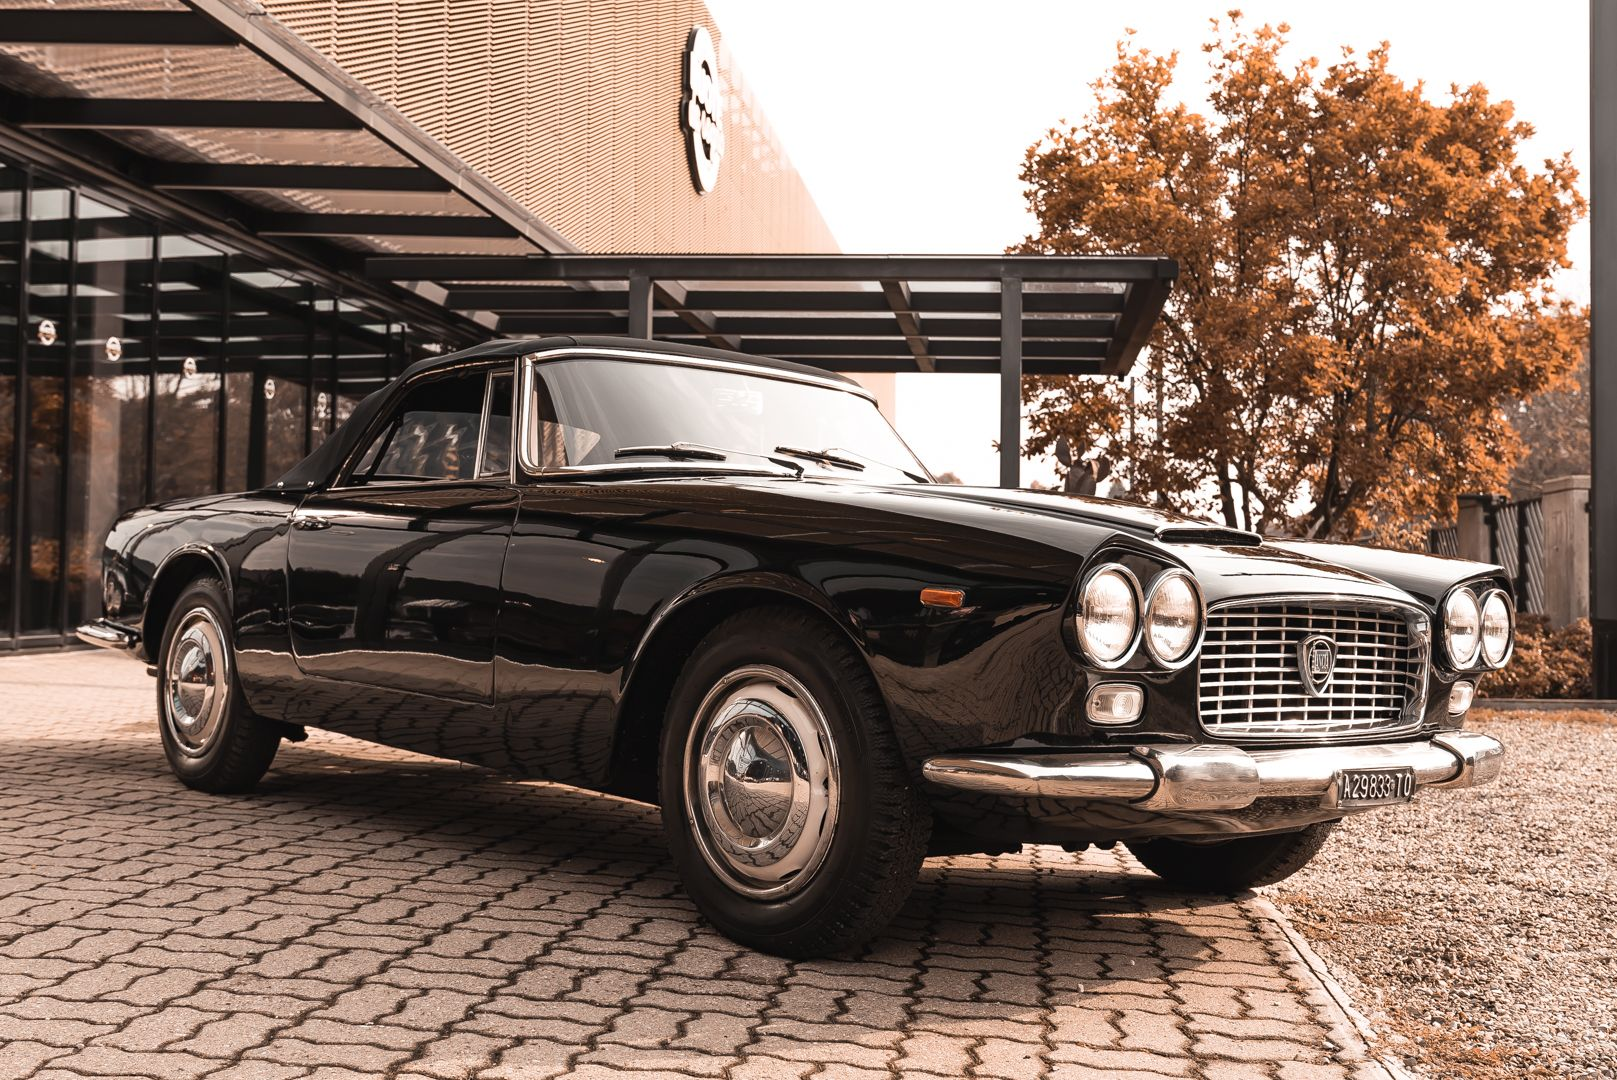 1968 Lancia Flaminia Touring Convertible 2800 3C 79133